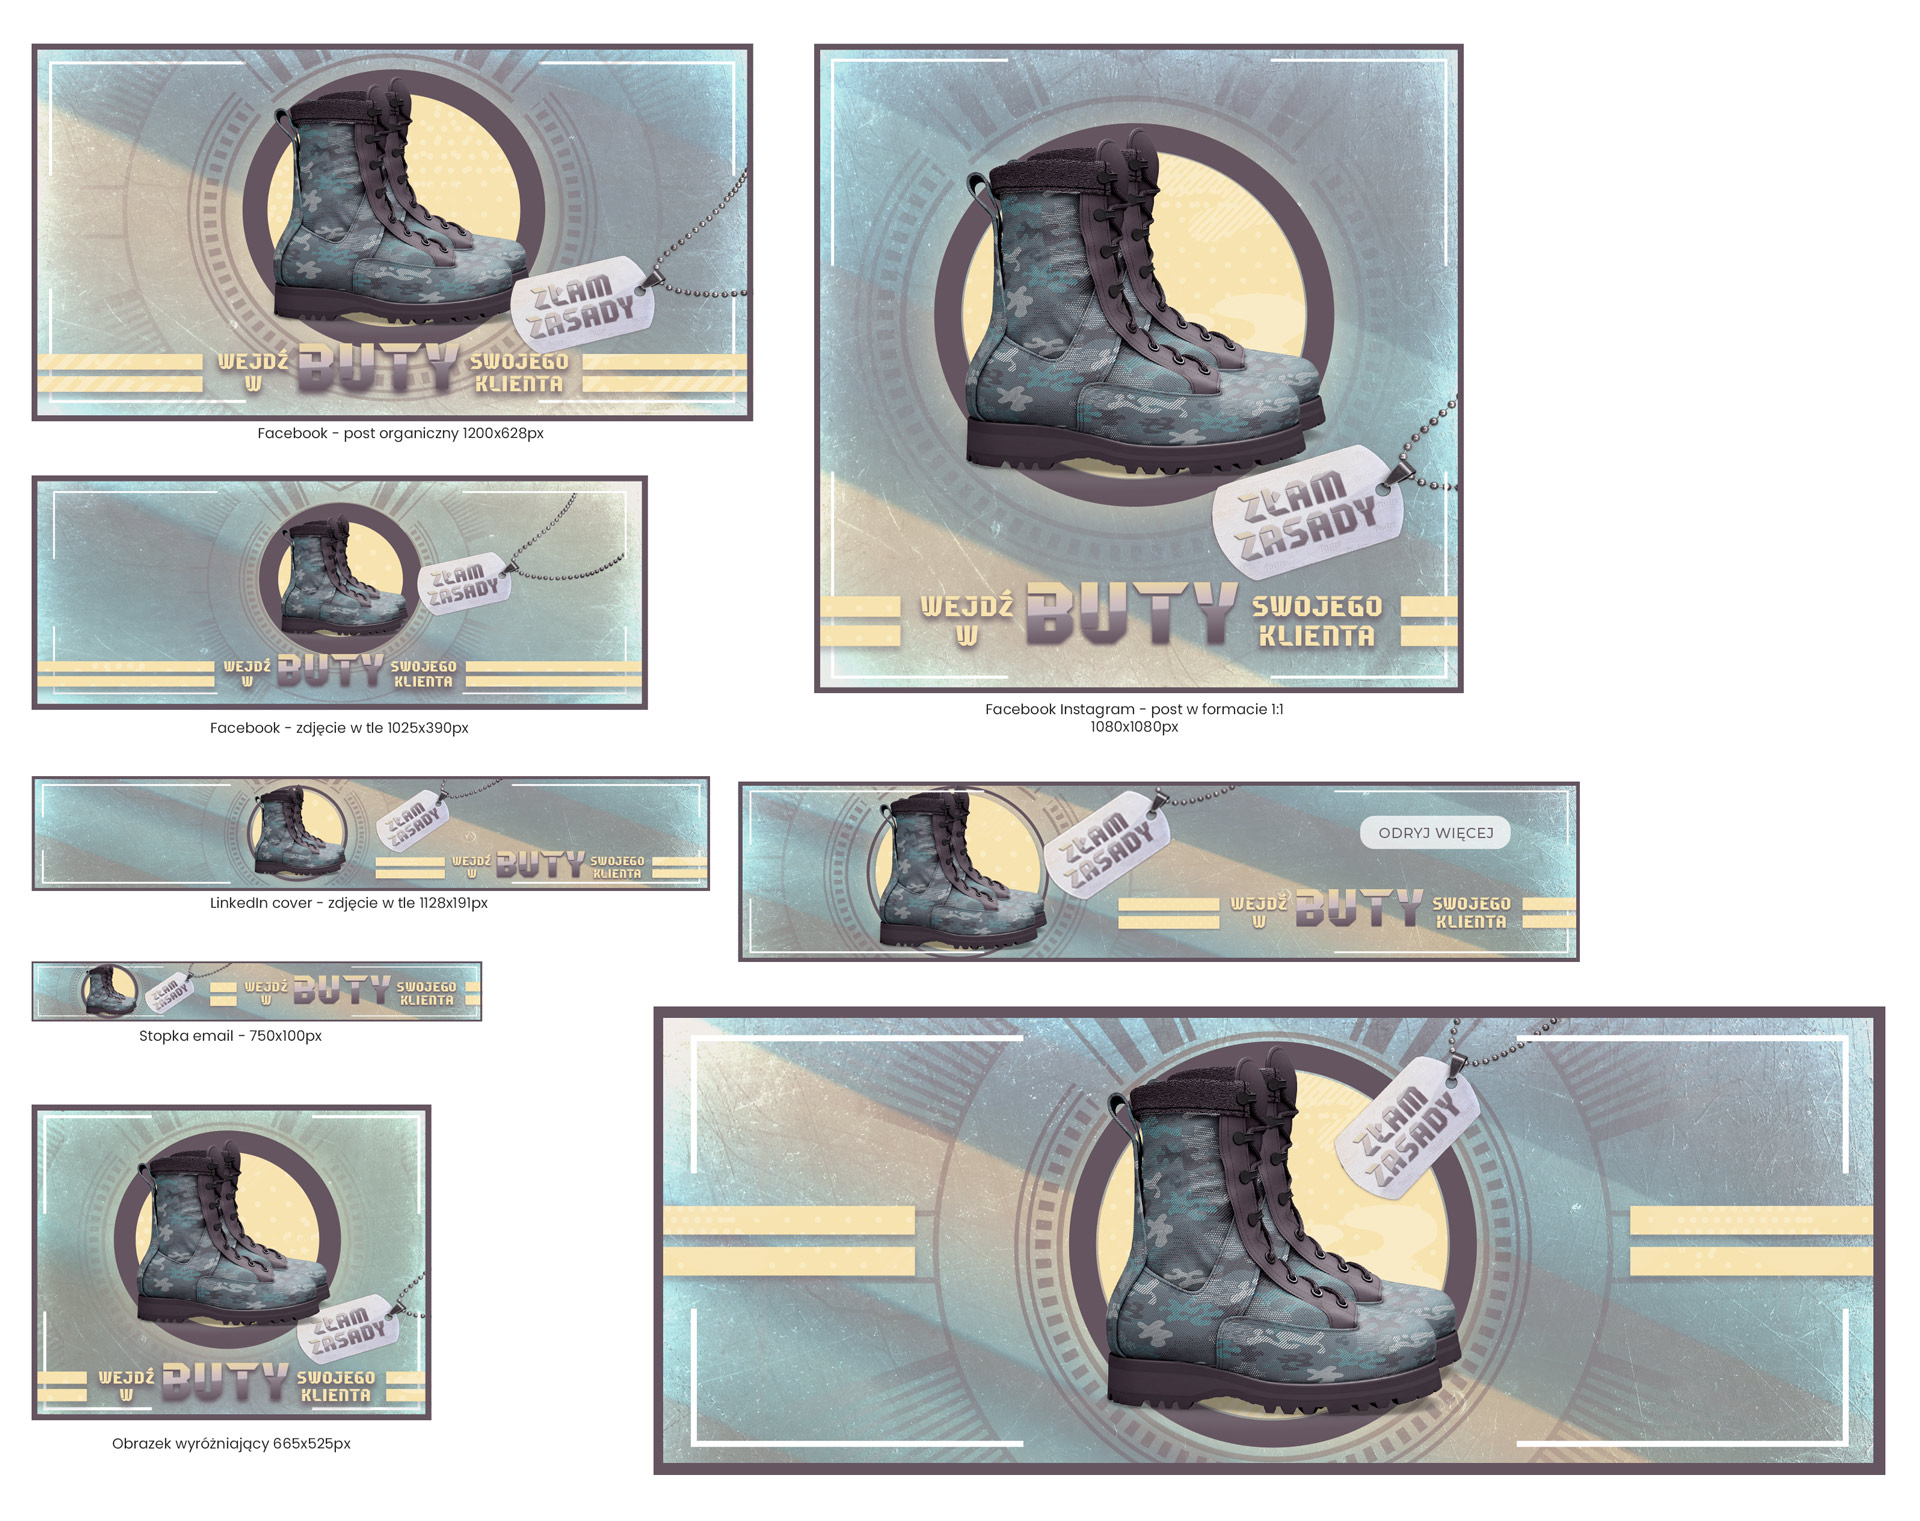 grafik kampanii reklamowej - key visual - composition